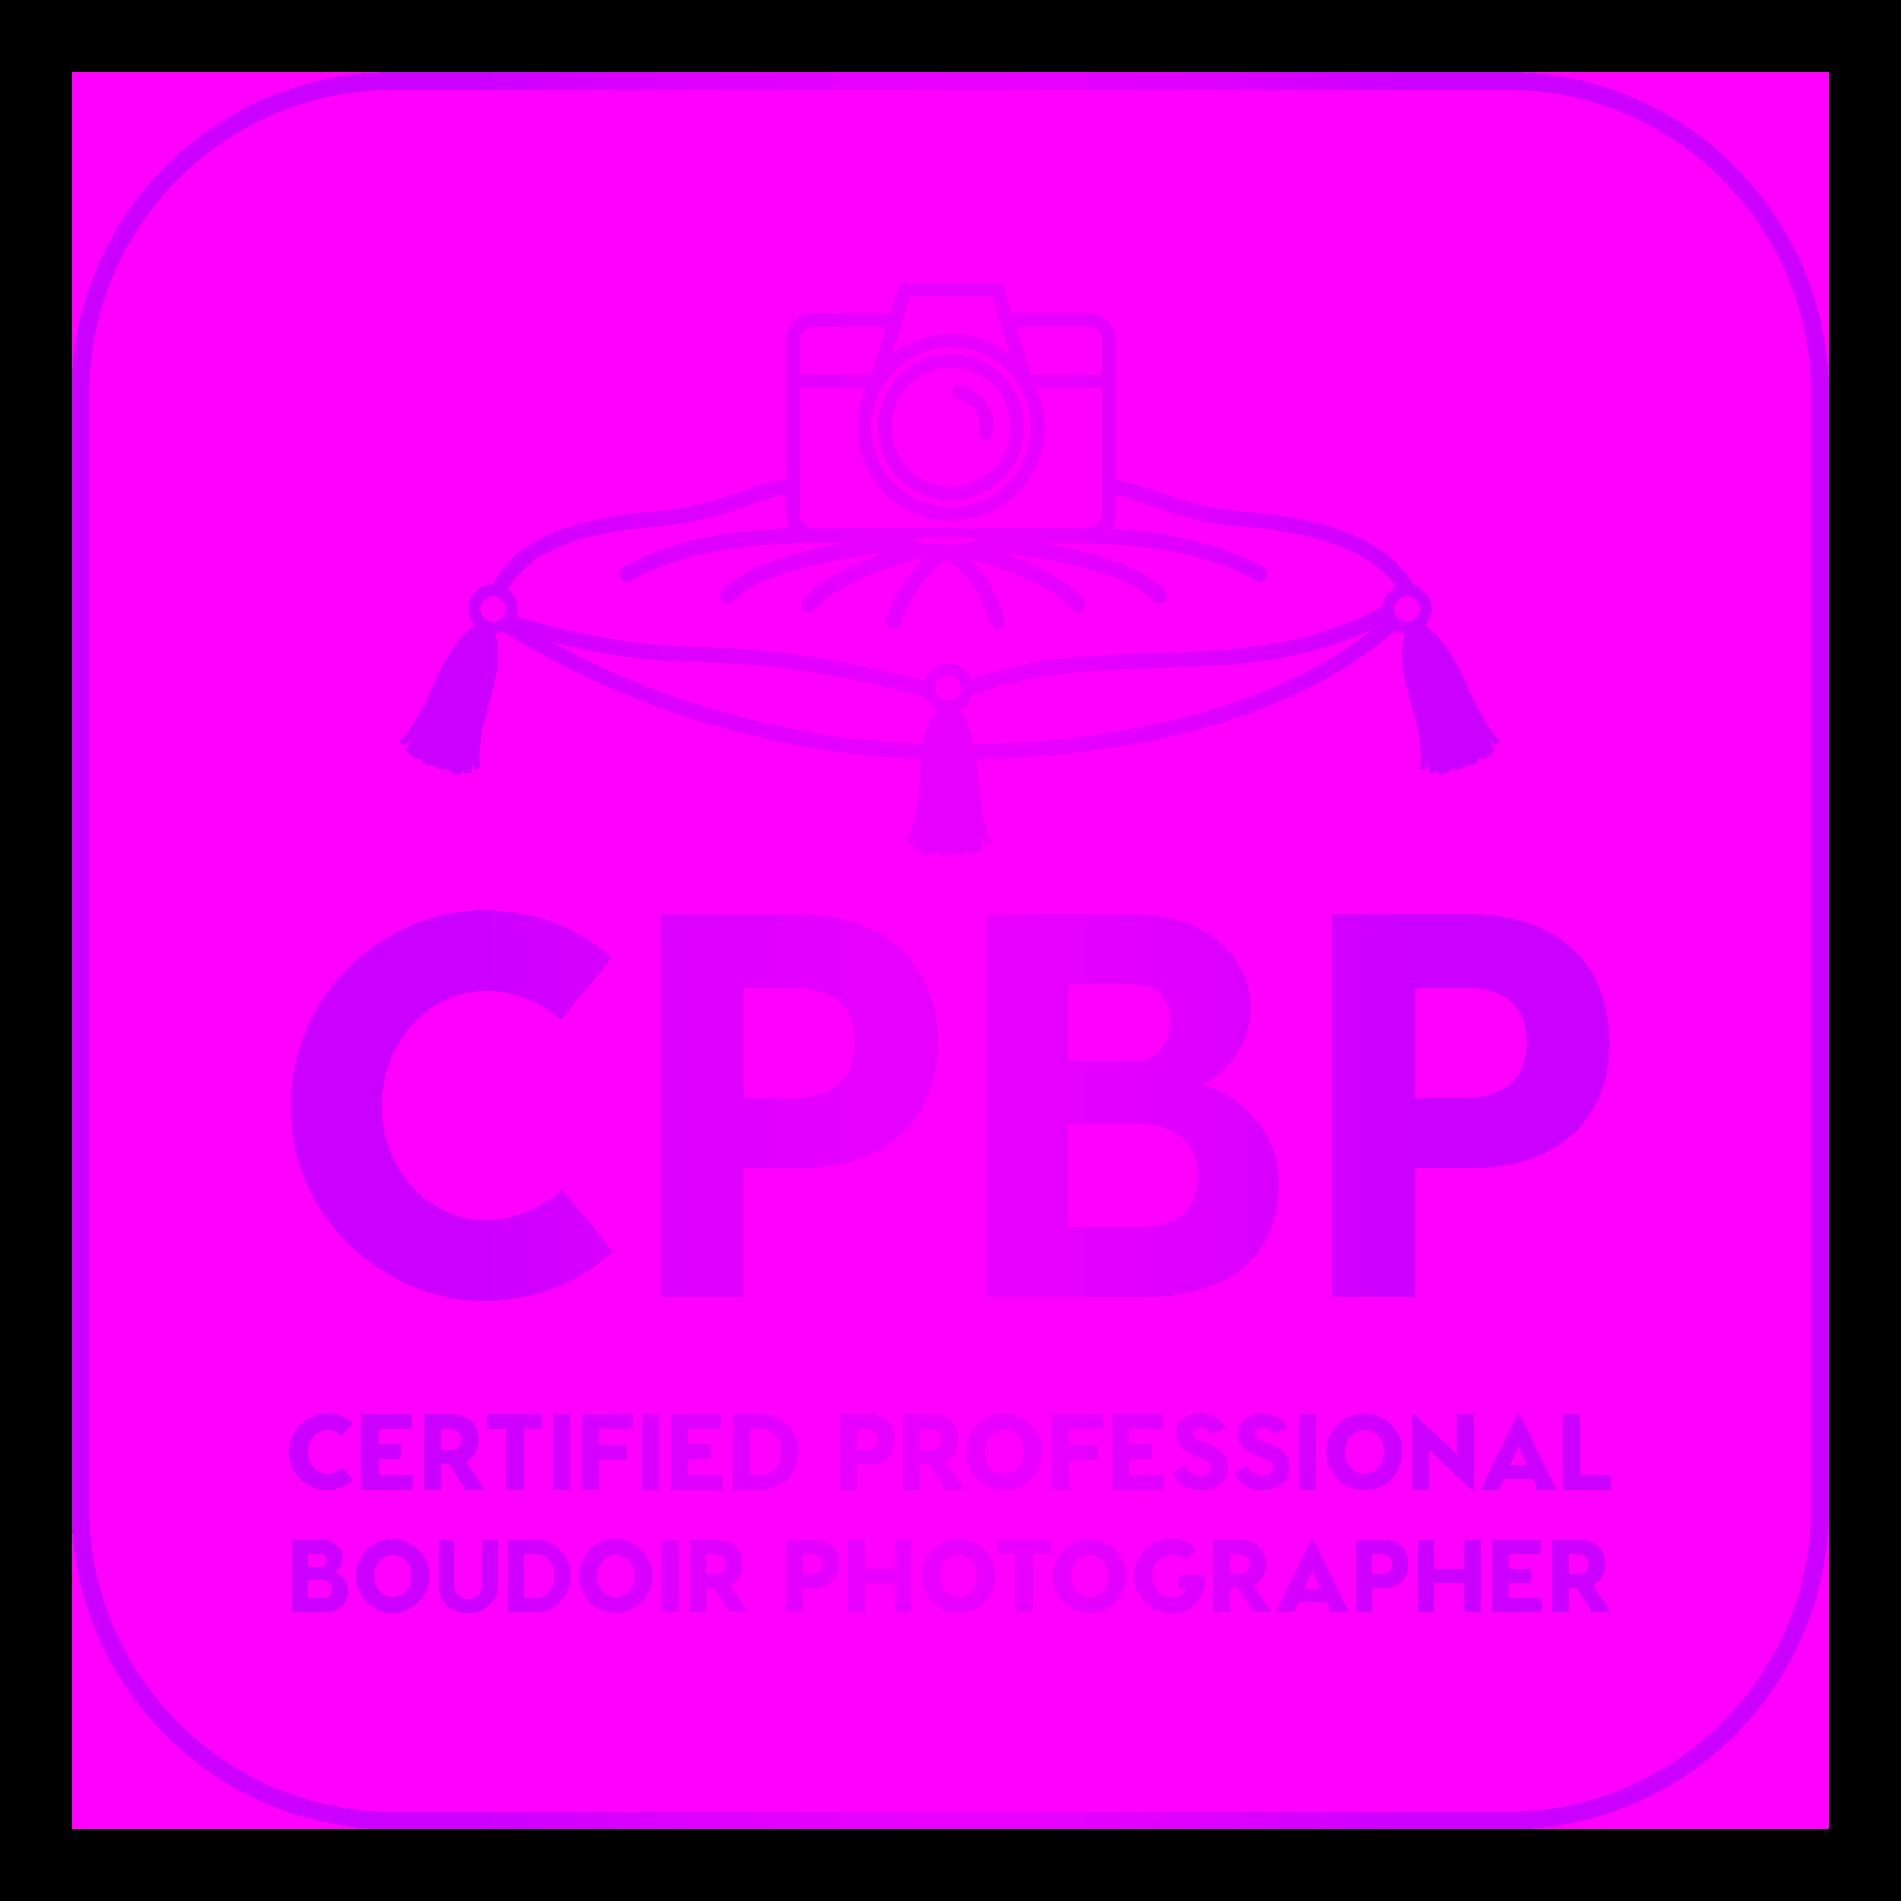 CPBP_Pink